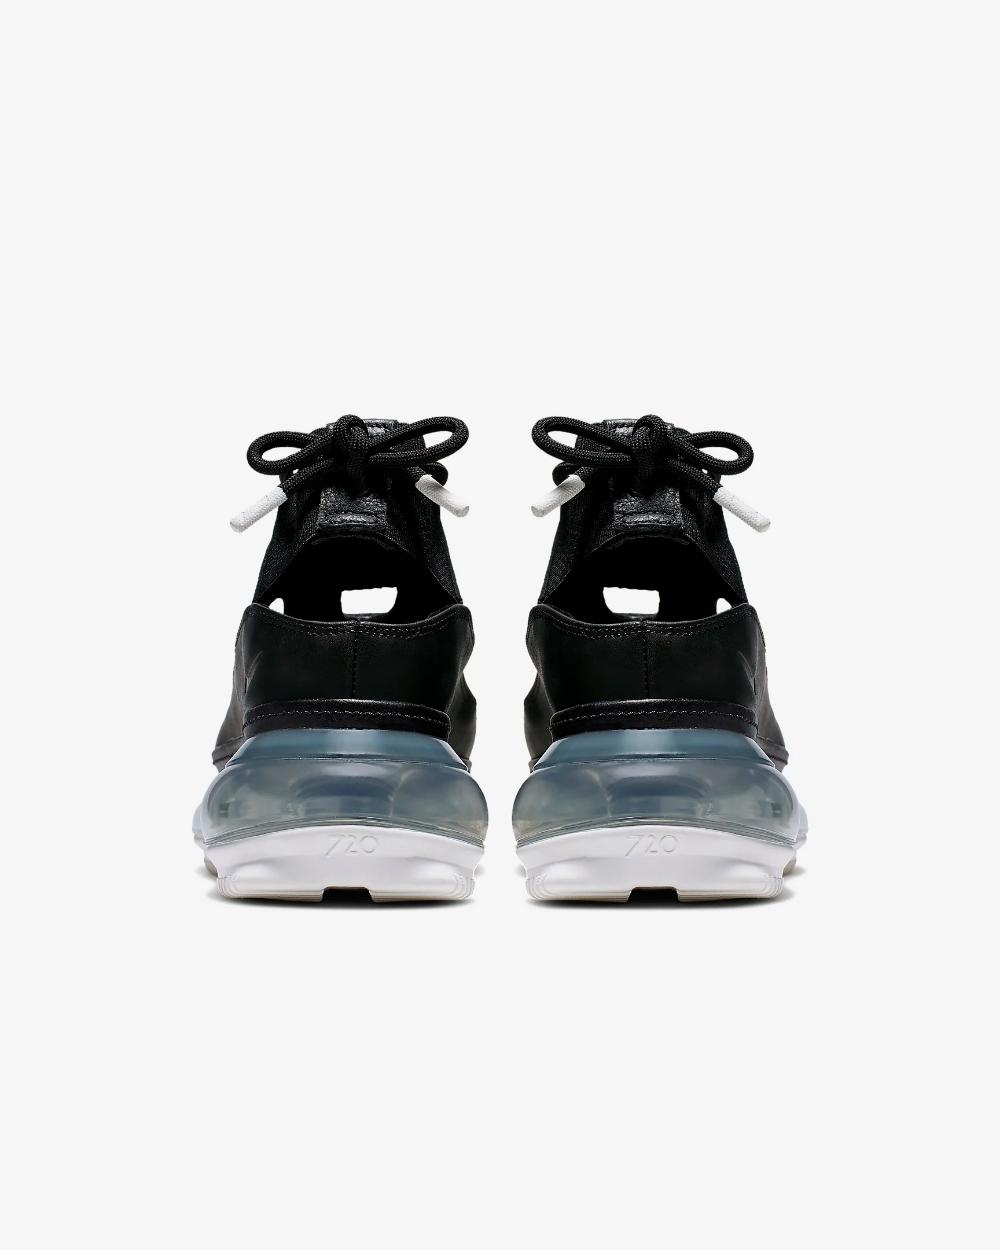 Nike Air Max Ff 720 Women S Shoe Nike Com Nike Air Max Women Shoes Nike Shoes Women